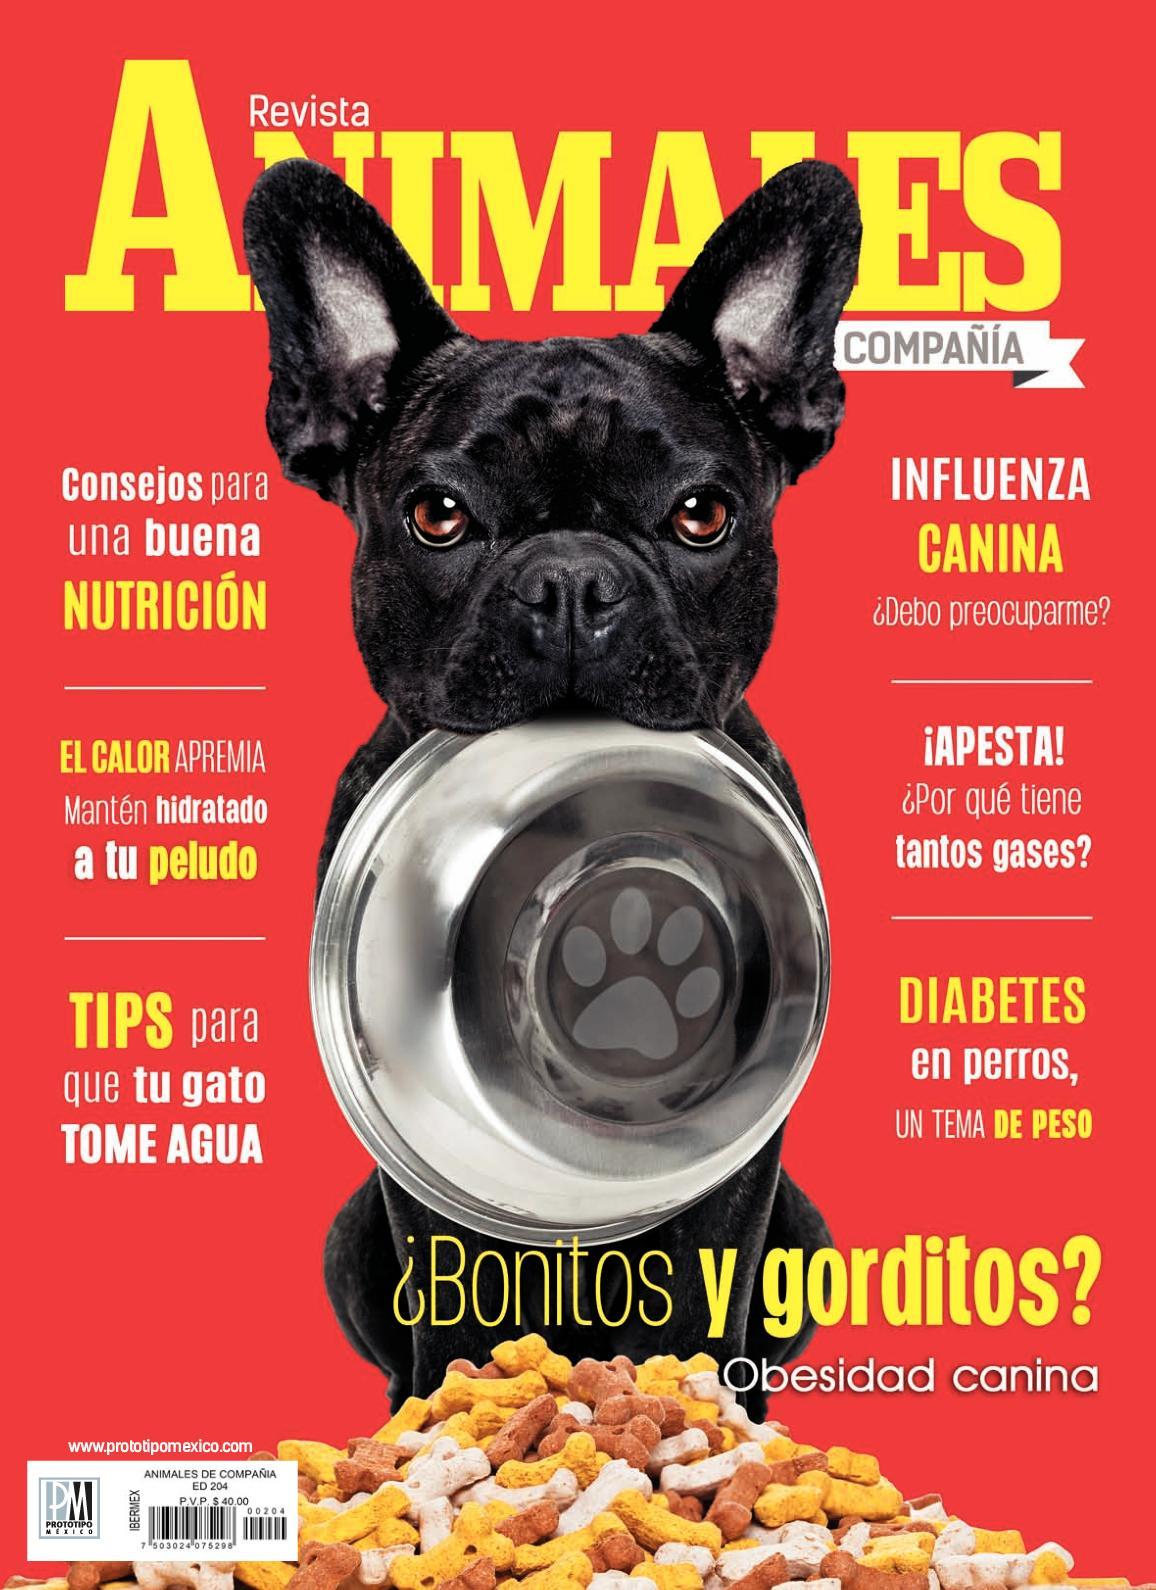 terapia larval buenas pautas diabetes